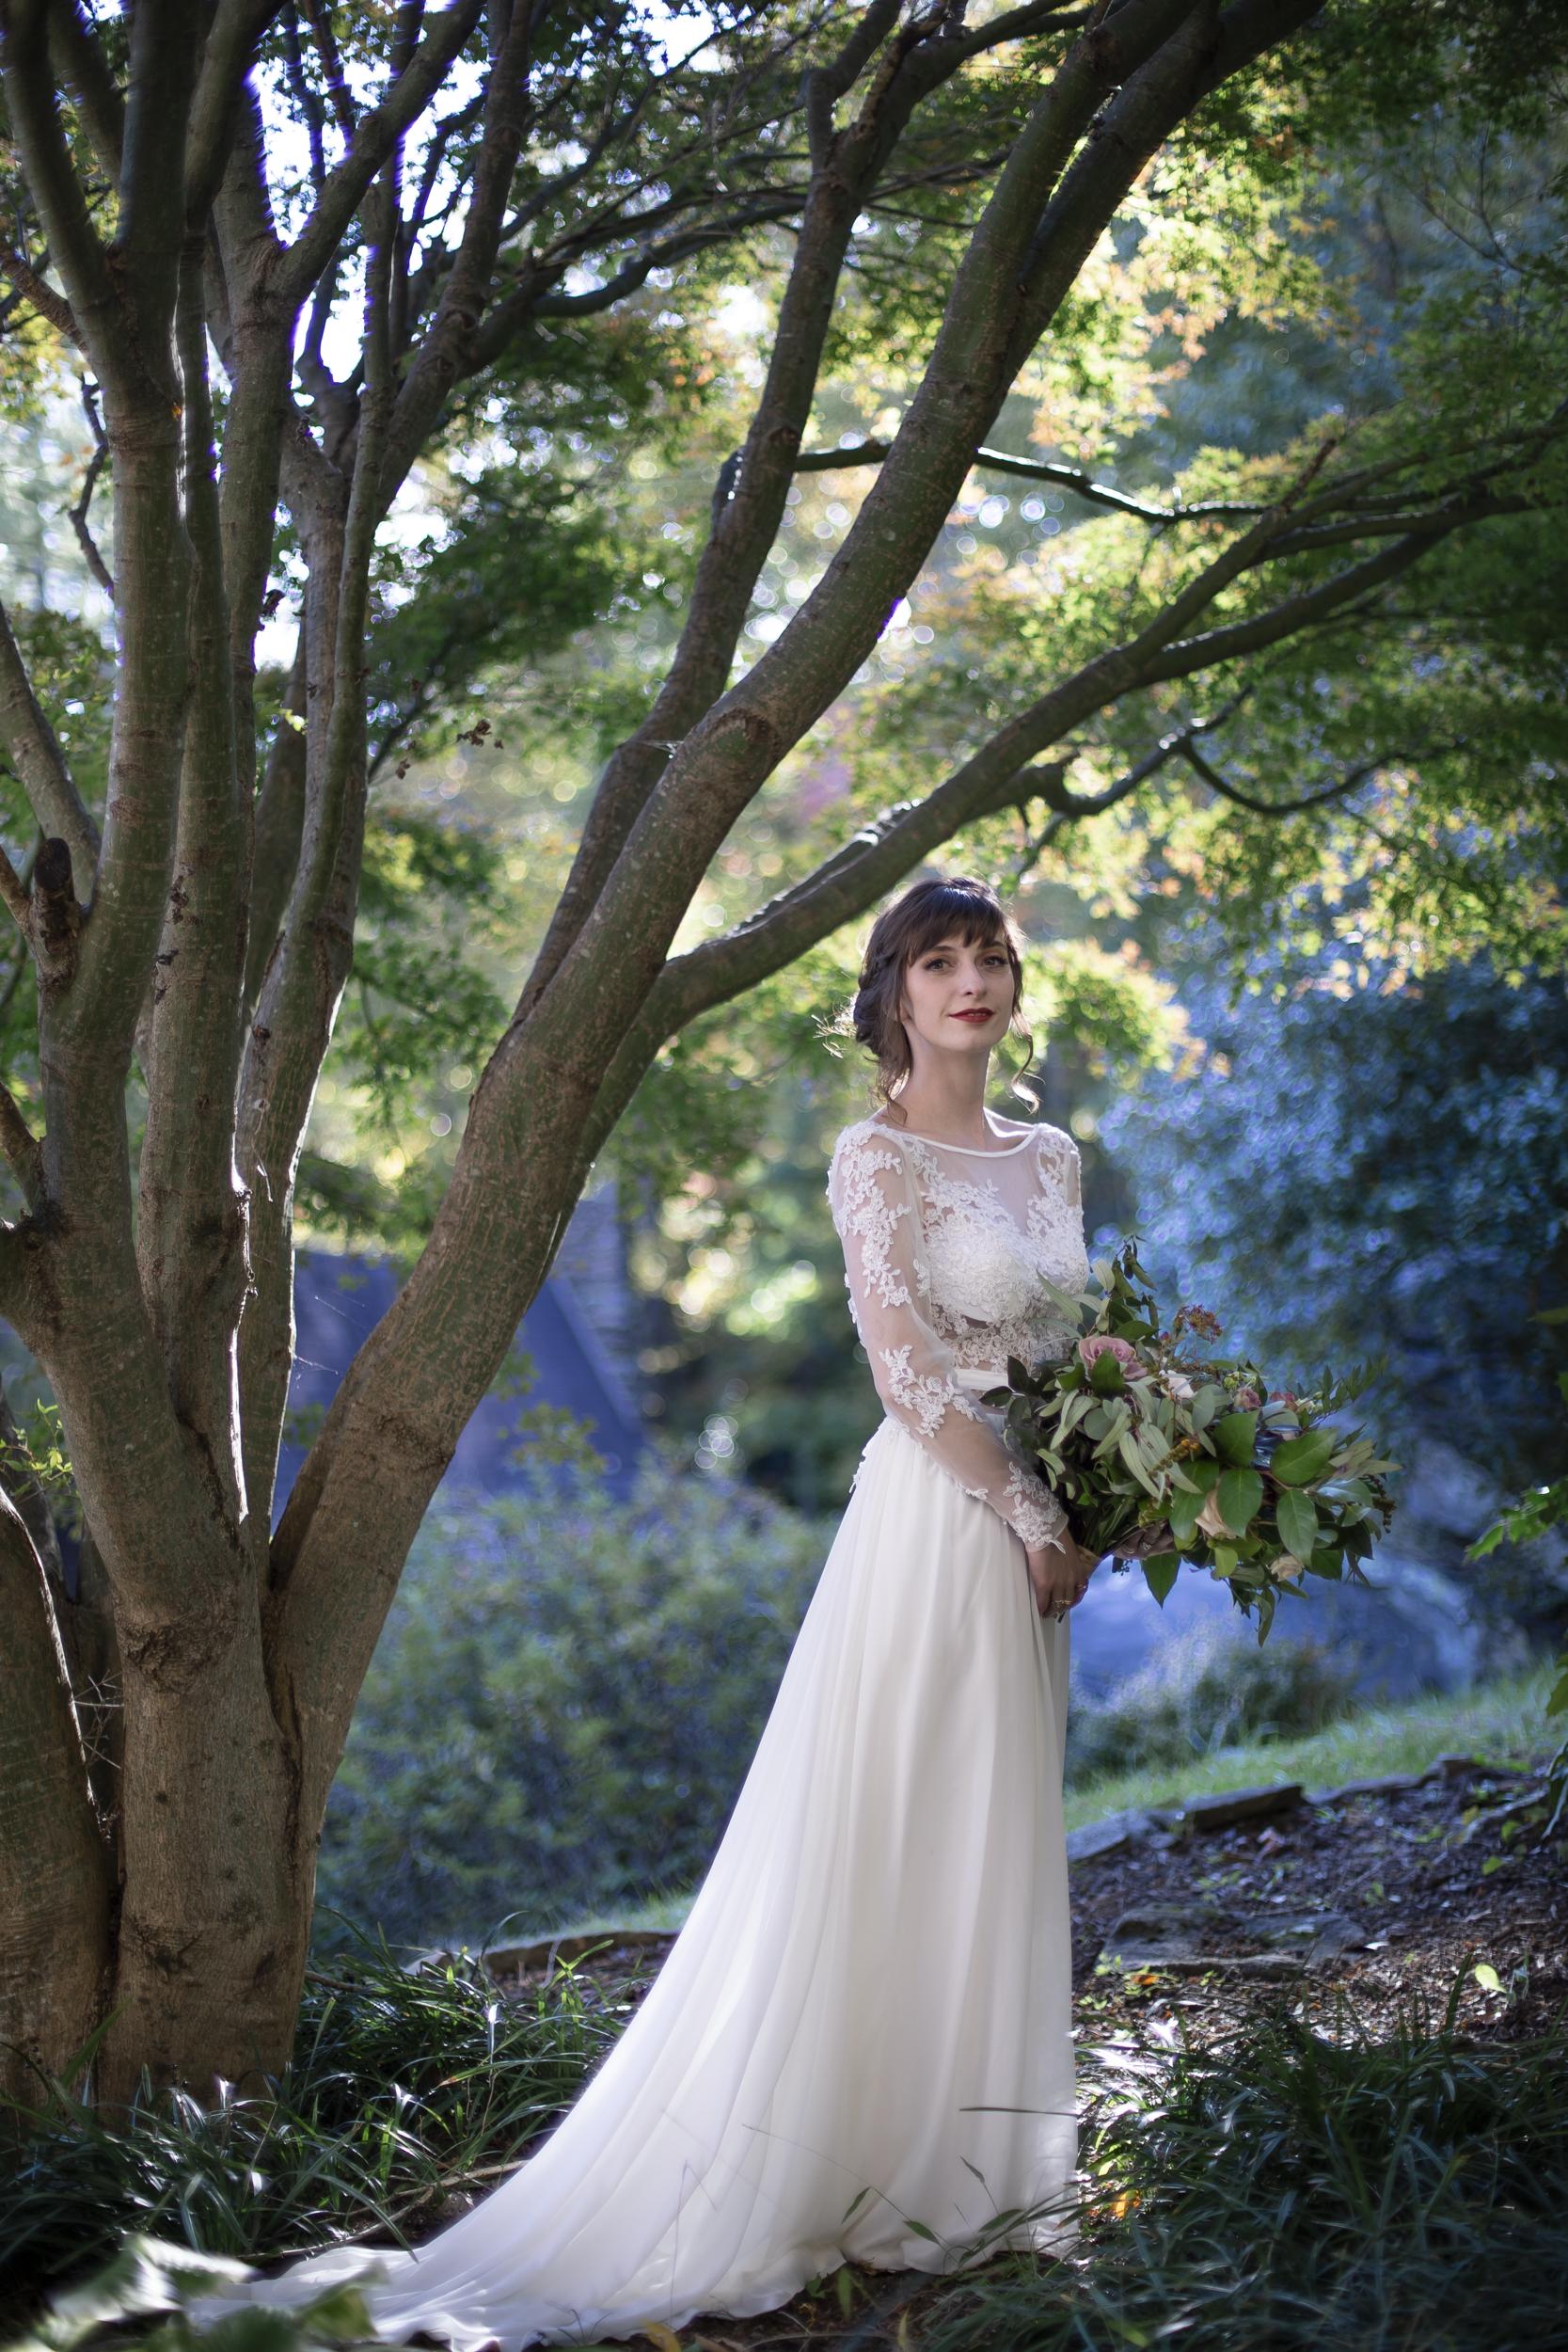 Laurel Falls Wedding October 2018_Allison and Josh__Lola Salon_Flora_Photo by Studio Misha Photography-75.jpg